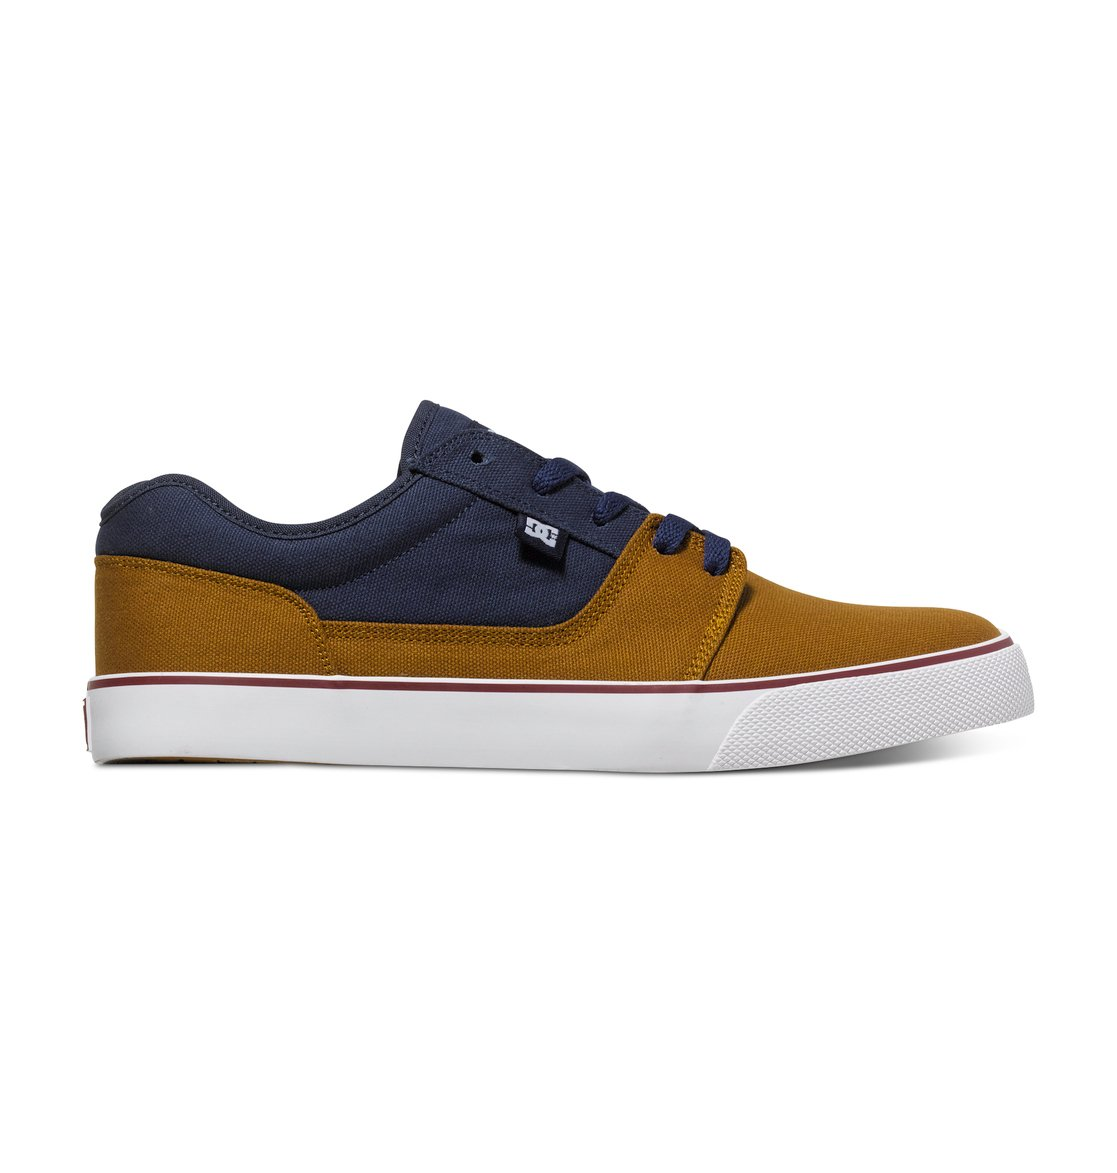 Tonik TX - Dcshoes������ ������� ���� Tonik TX �� DC Shoes. <br>��������������: ������ � ������� ����������� ����, ����������������� ����������� ��� ����� ������� �������� �����, ������������� ���������� �������, ��������� ������� ���������� ������� DC Pill Pattern. <br>������: ����: �������� / ���������: �������� / �������: ������.<br>